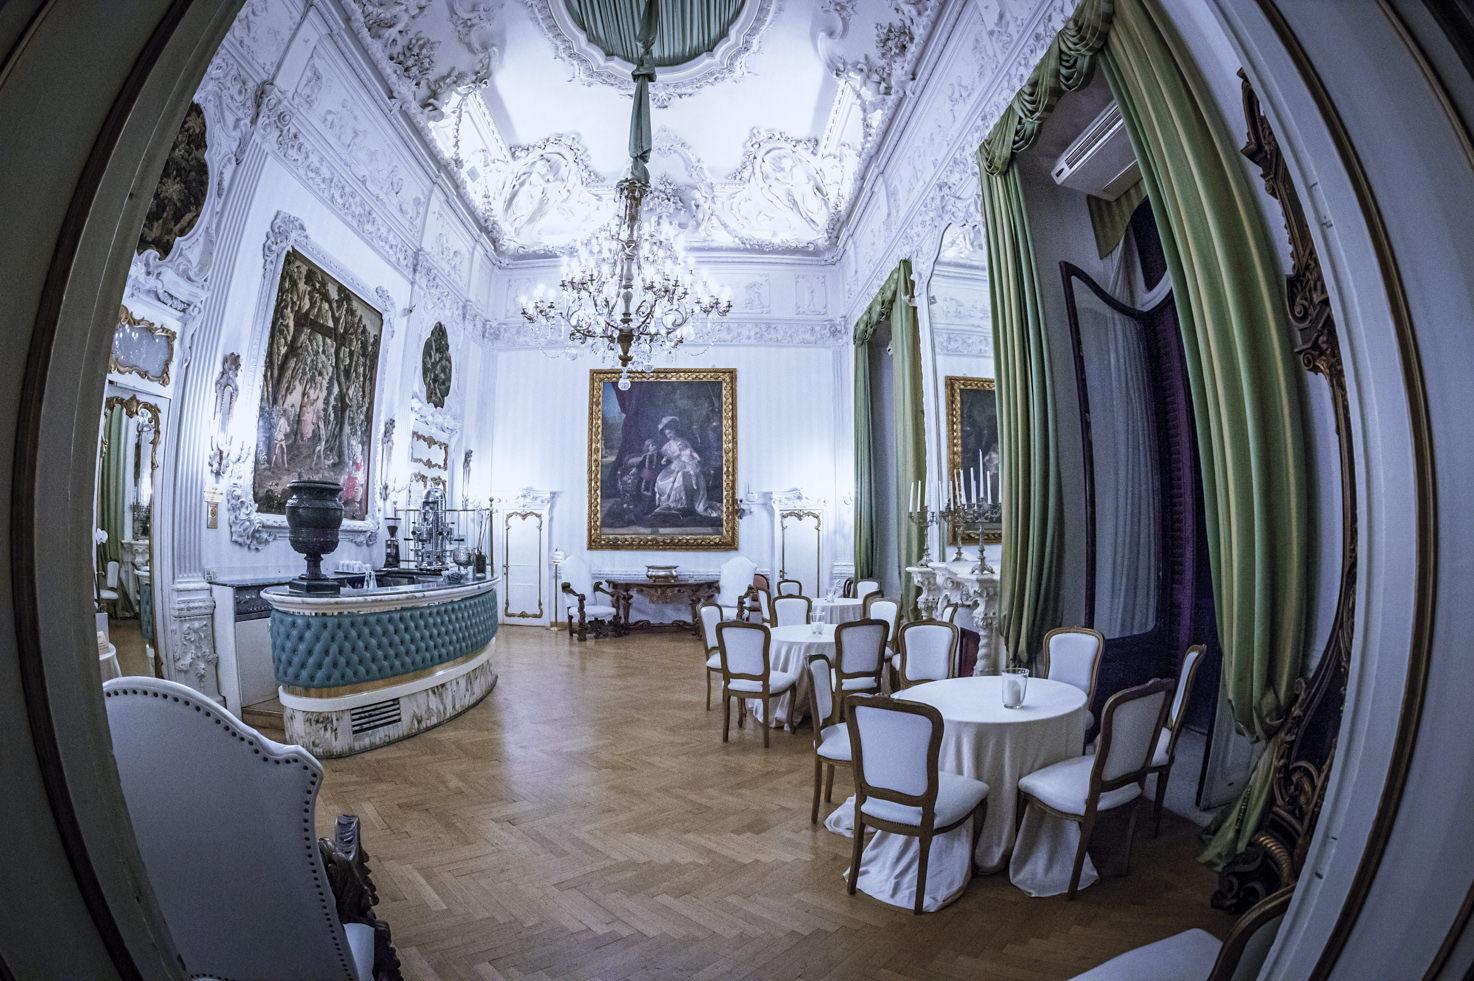 Hall with baroque stuccos